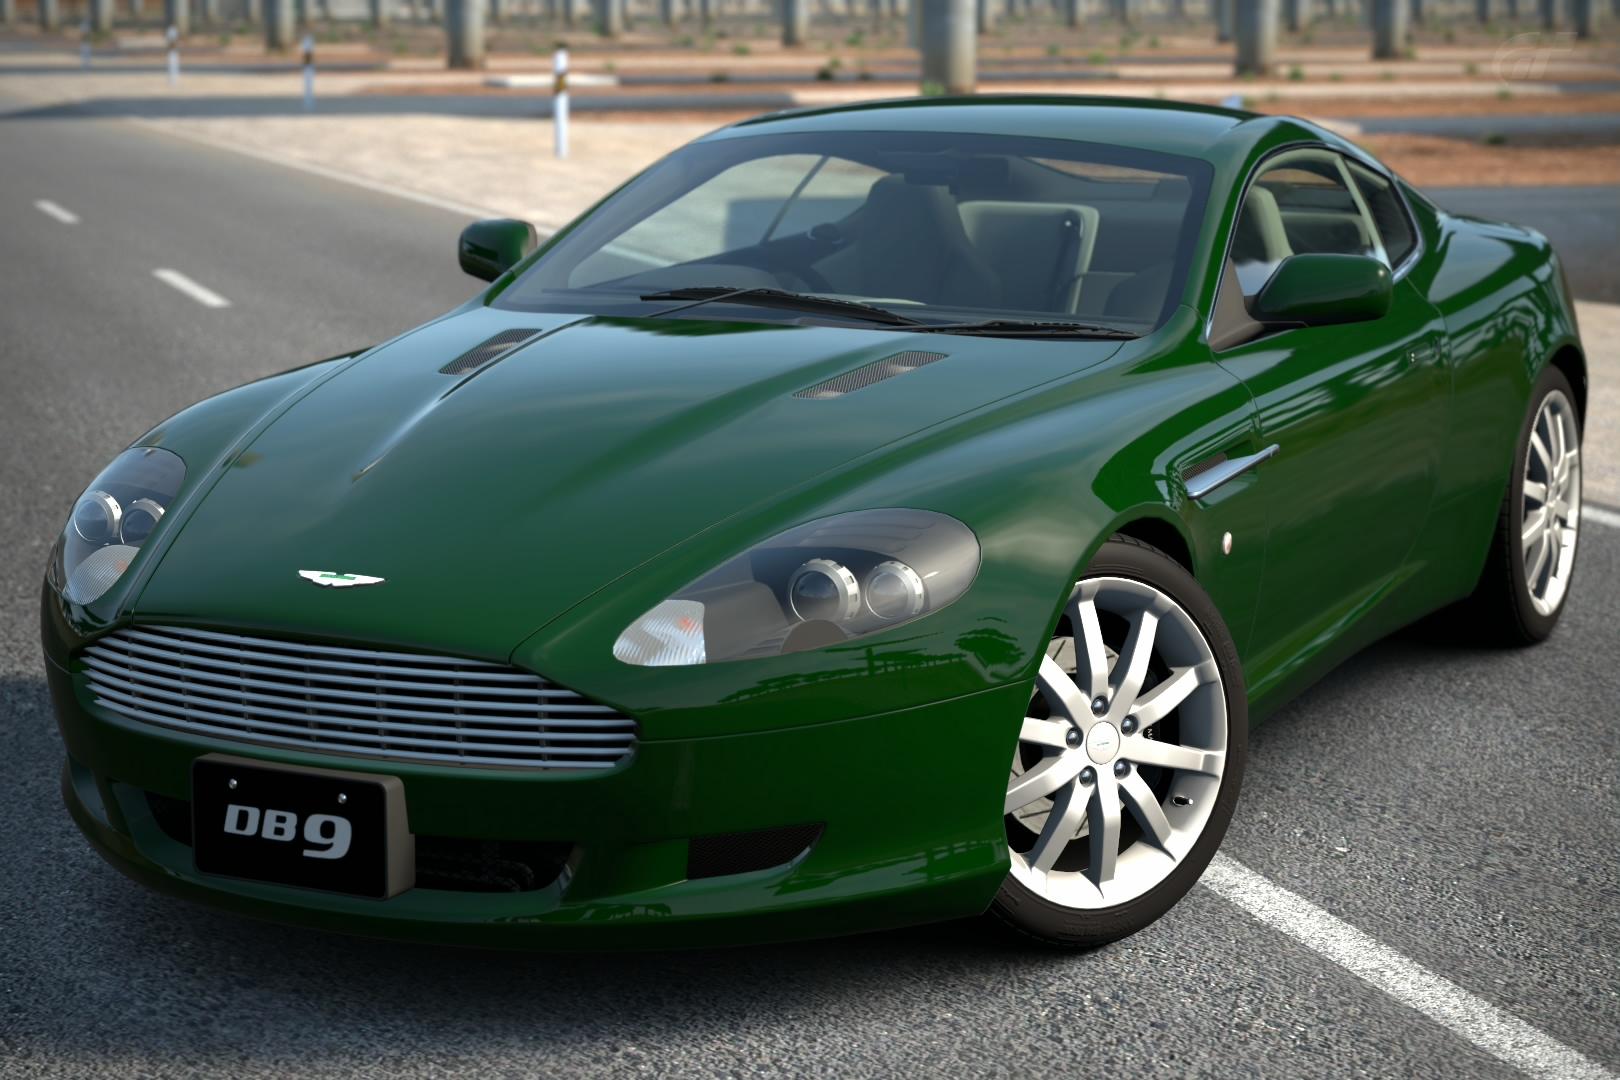 Aston Martin Db9 Coupe 06 Gran Turismo Wiki Fandom Powered By Wikia